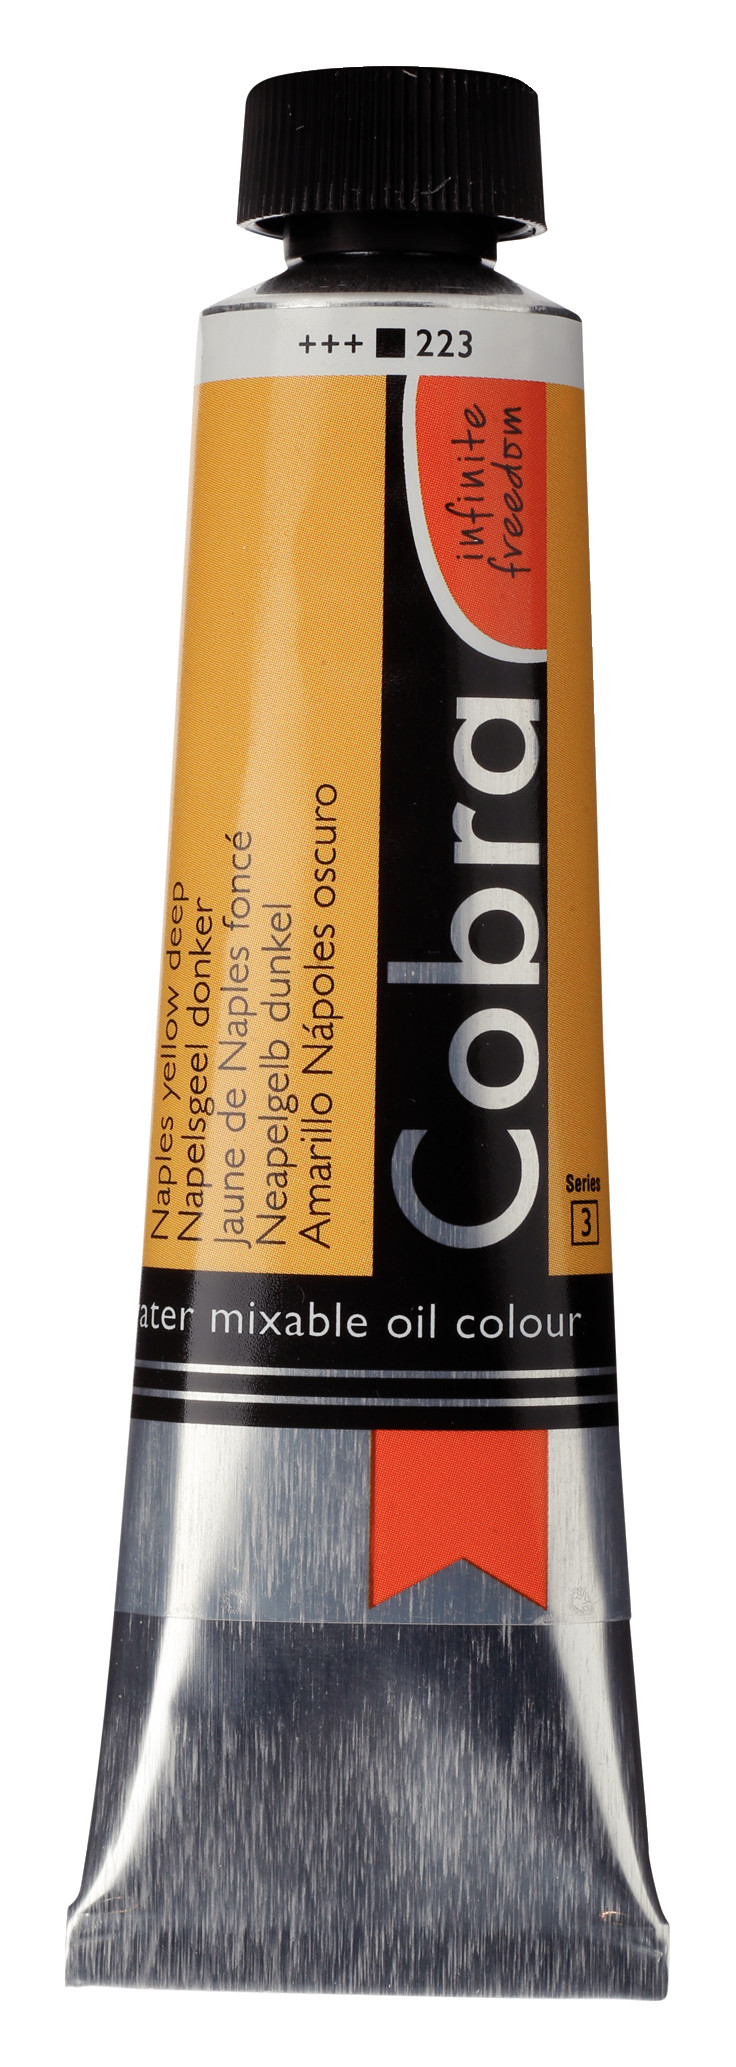 Cobra Artist Water Mixable Oil Colour Tube 40 ml Naples yellow deep 223